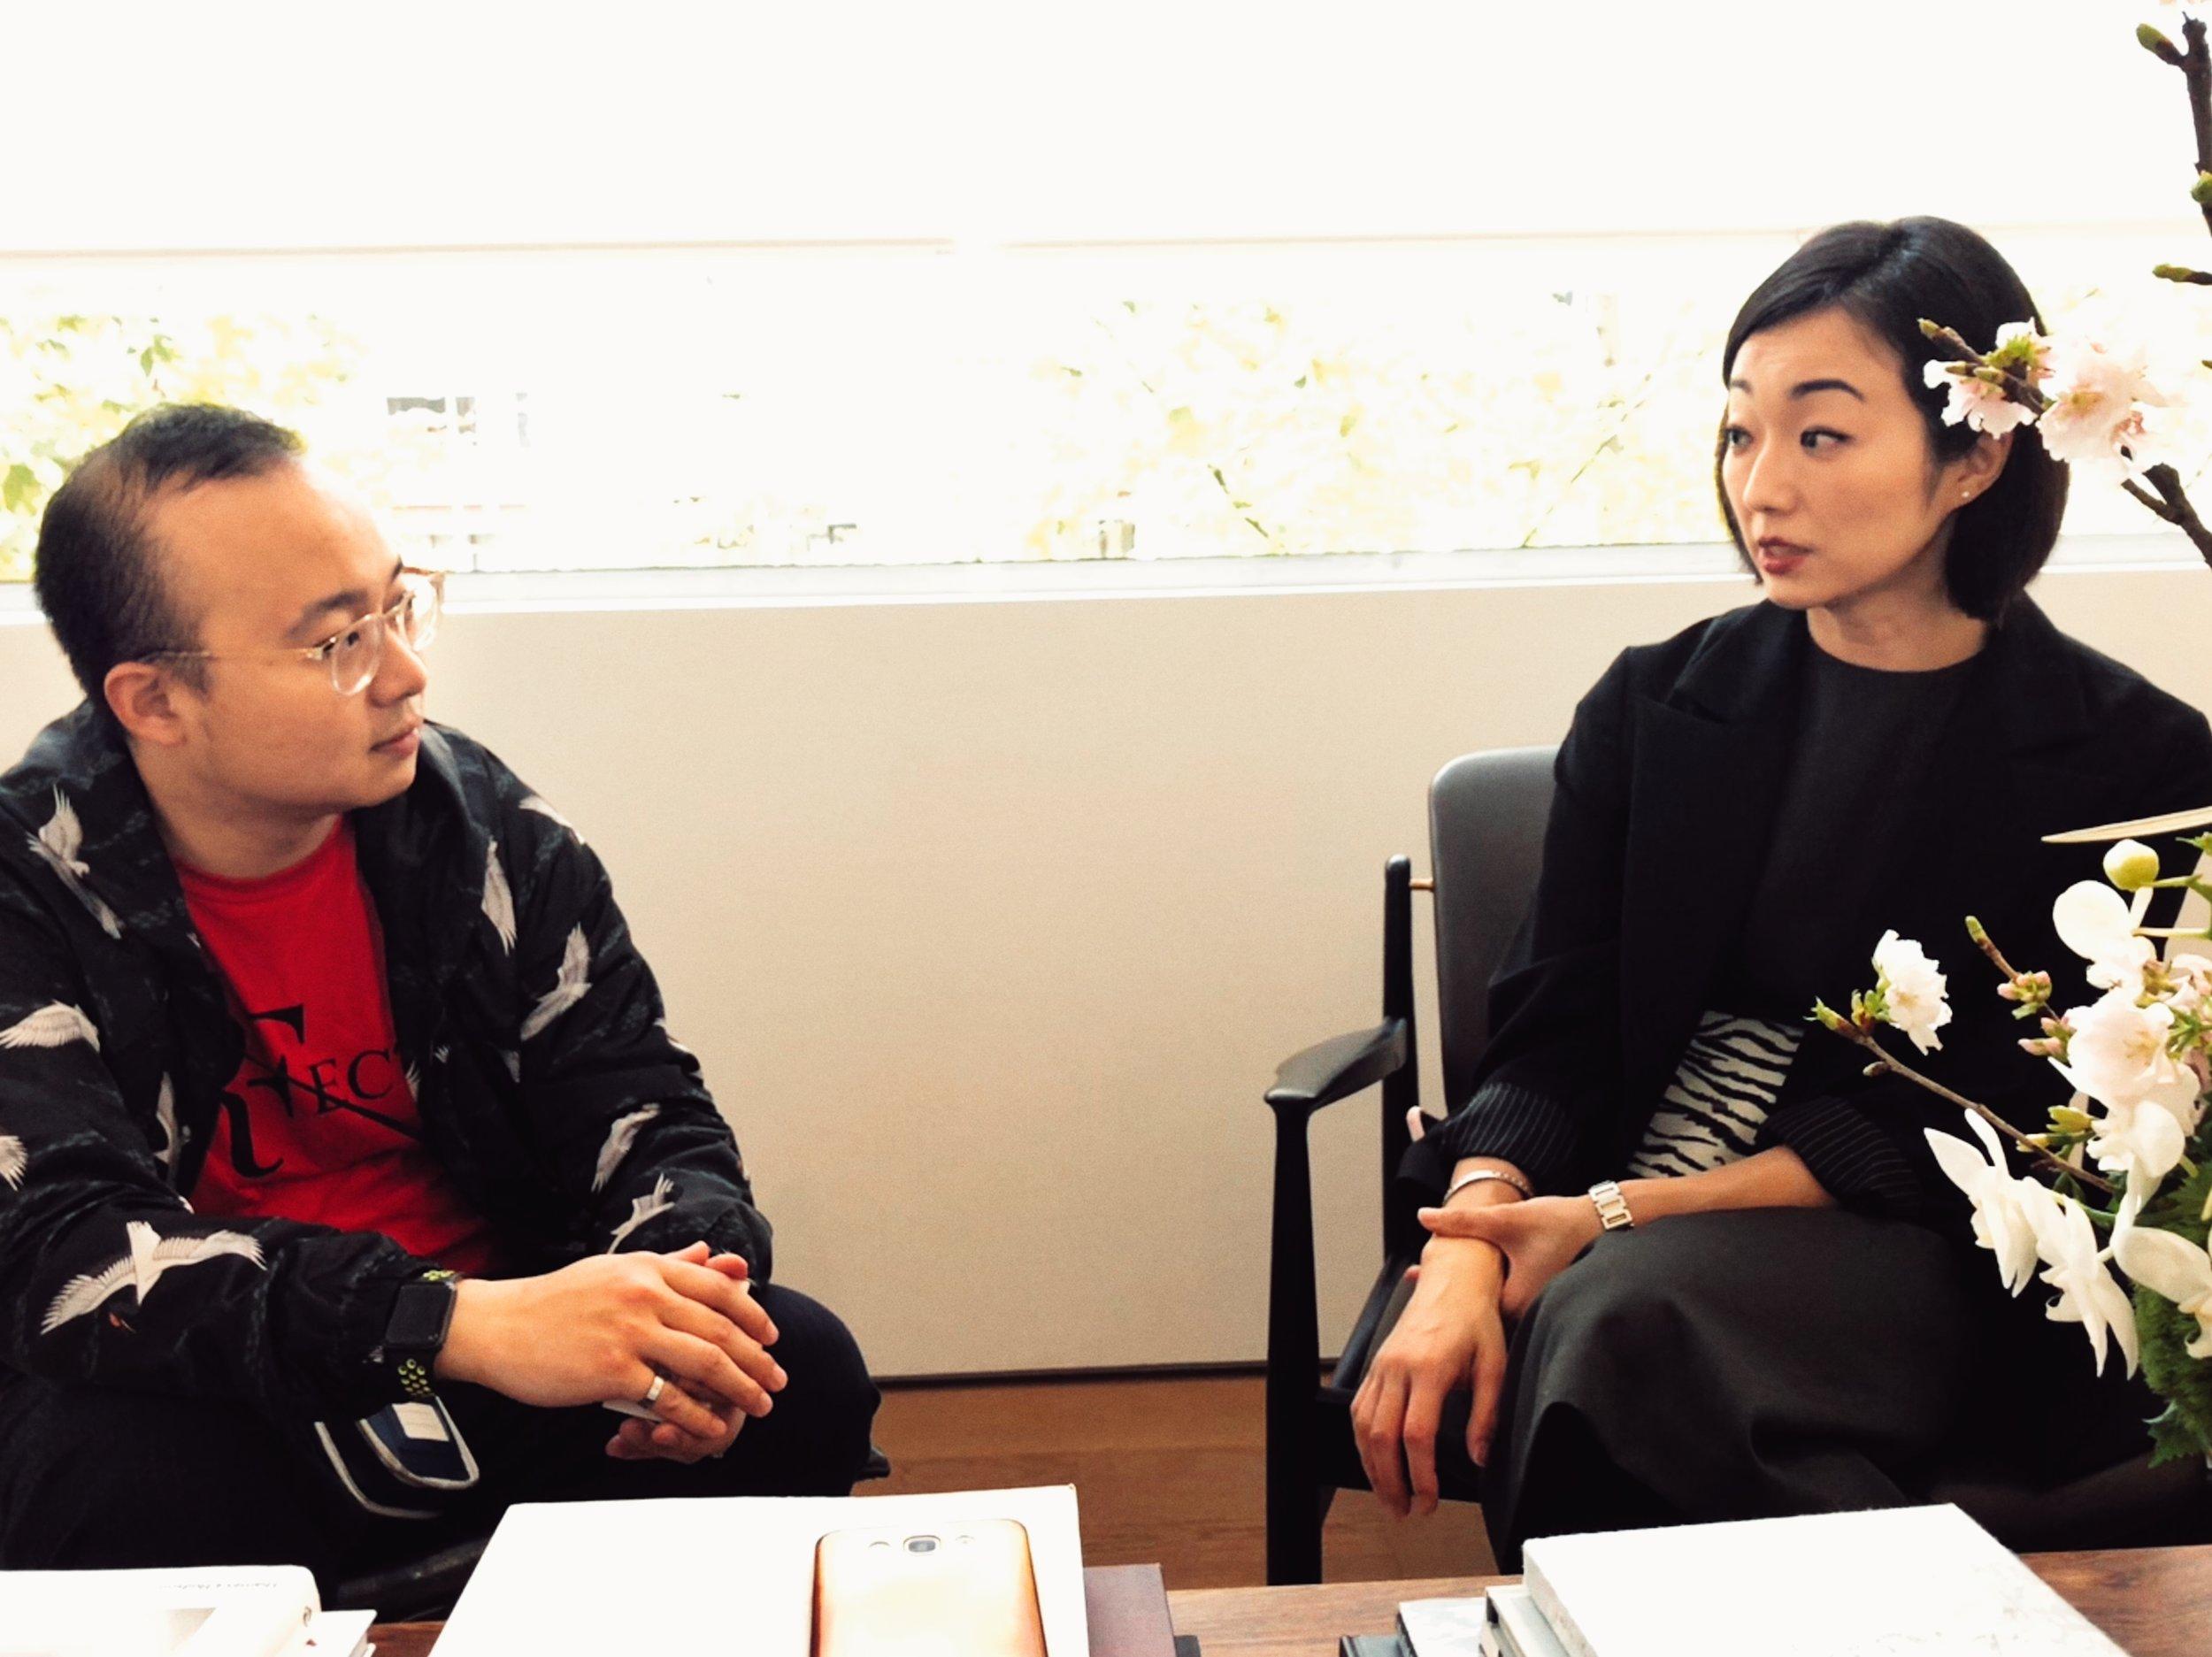 Ryan &Huang Yaji - SNAPPP照玩雜誌x 亞紀畫廊